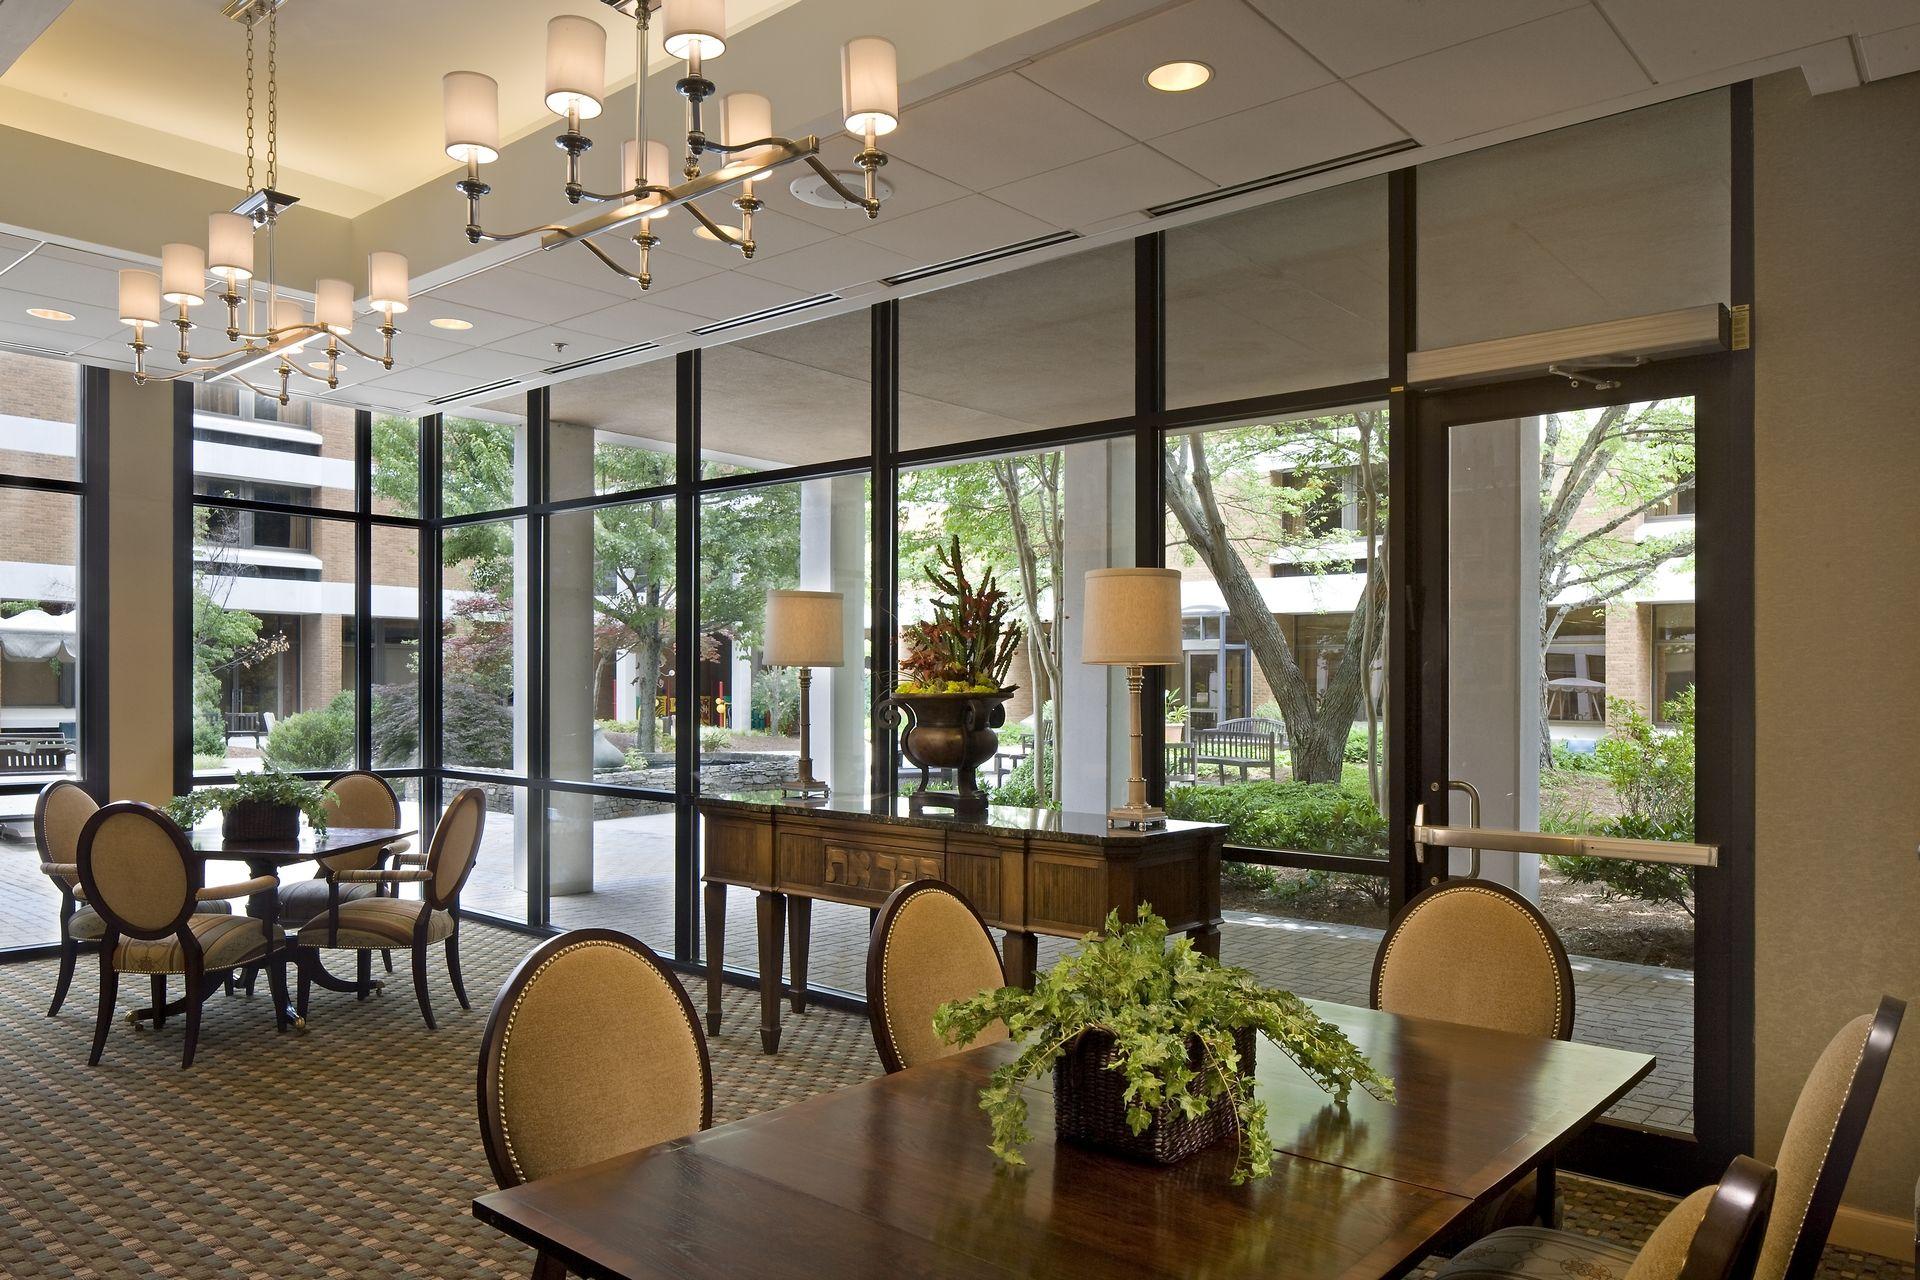 Nursing home design considerations home design for Apartment design considerations